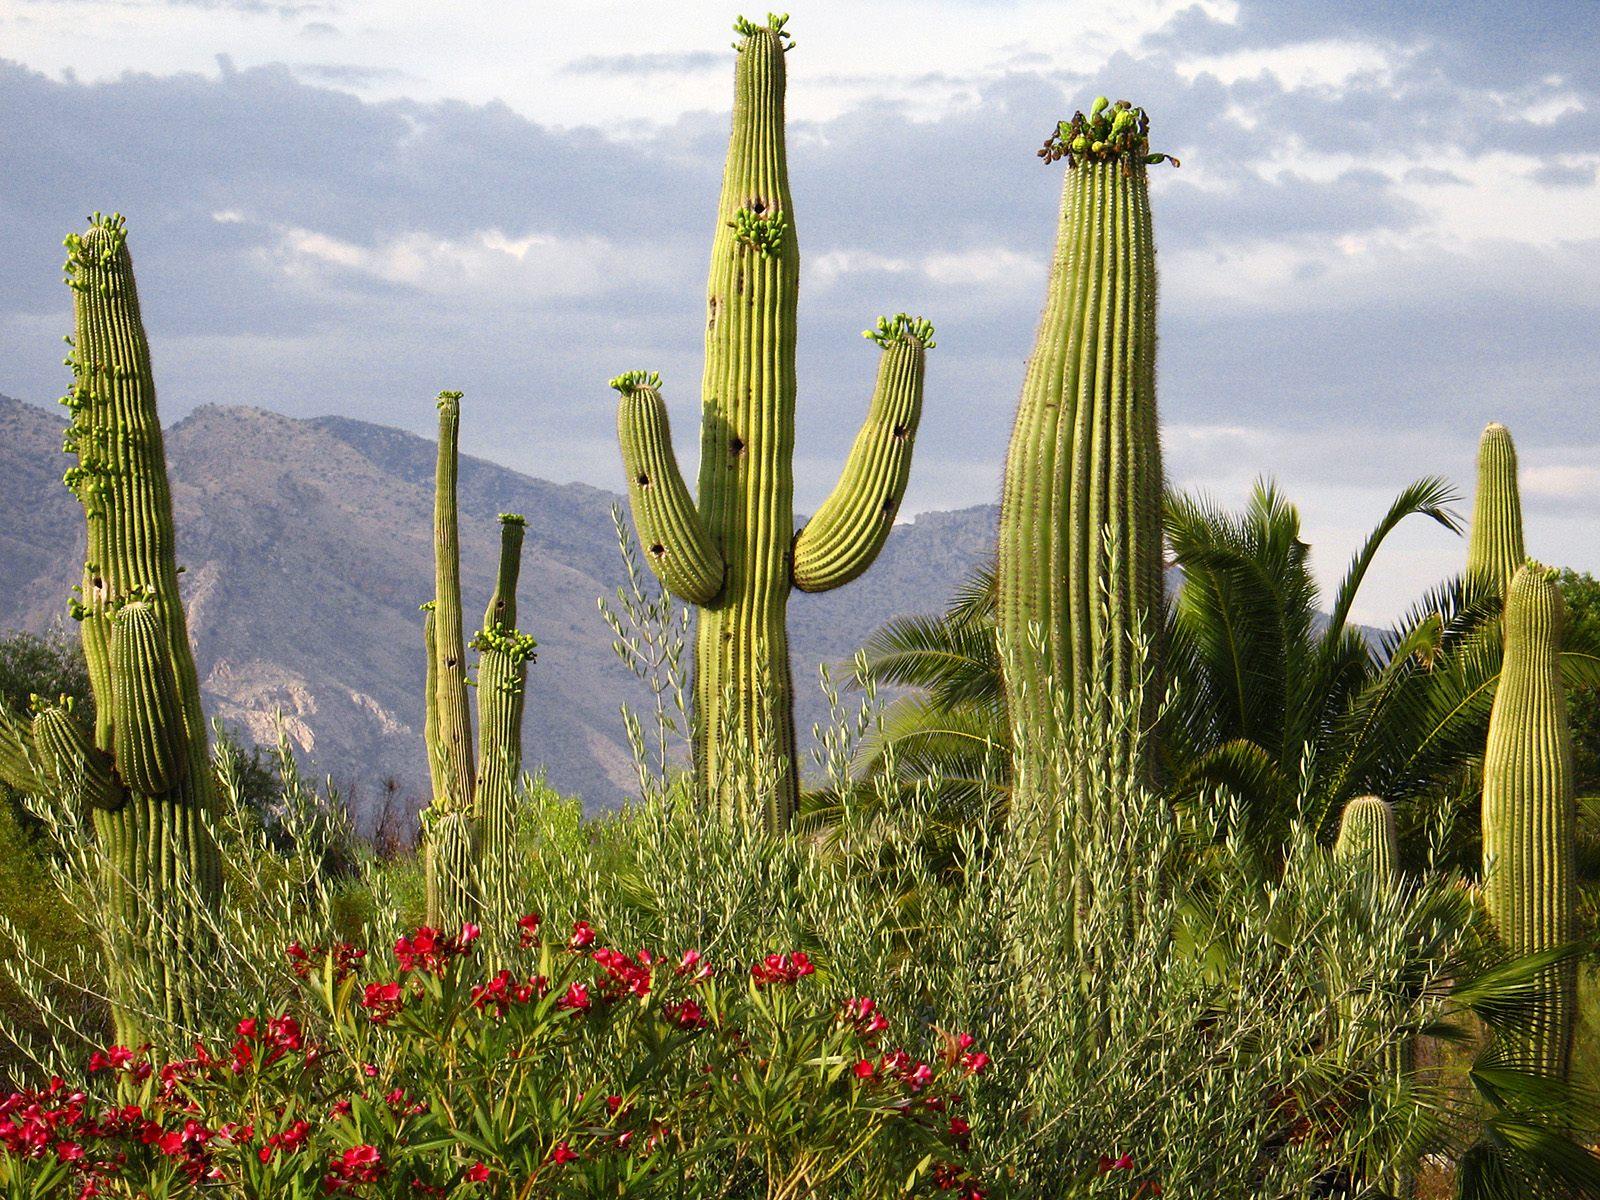 desert cactus hd wallpapers life insurance canada. Black Bedroom Furniture Sets. Home Design Ideas